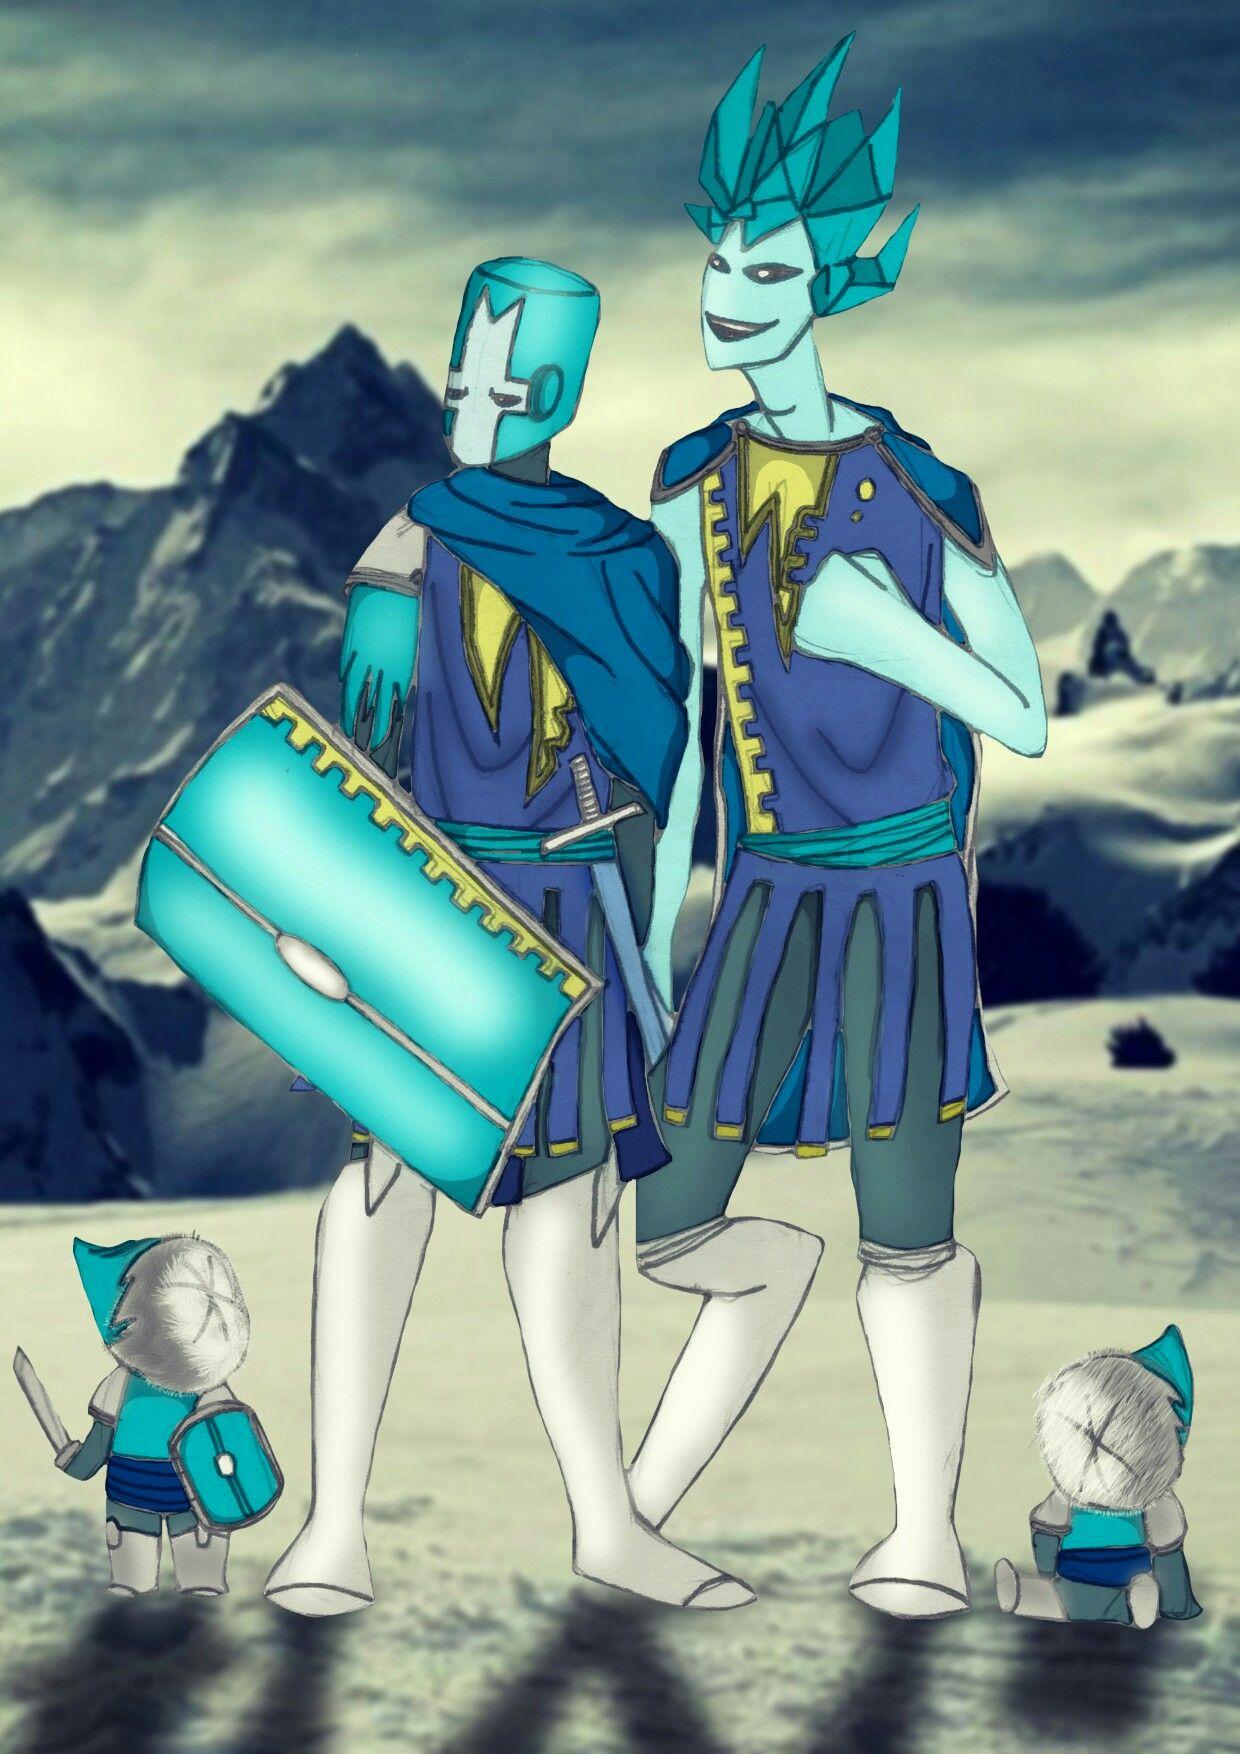 castle crashers blue knight ice knight ice king